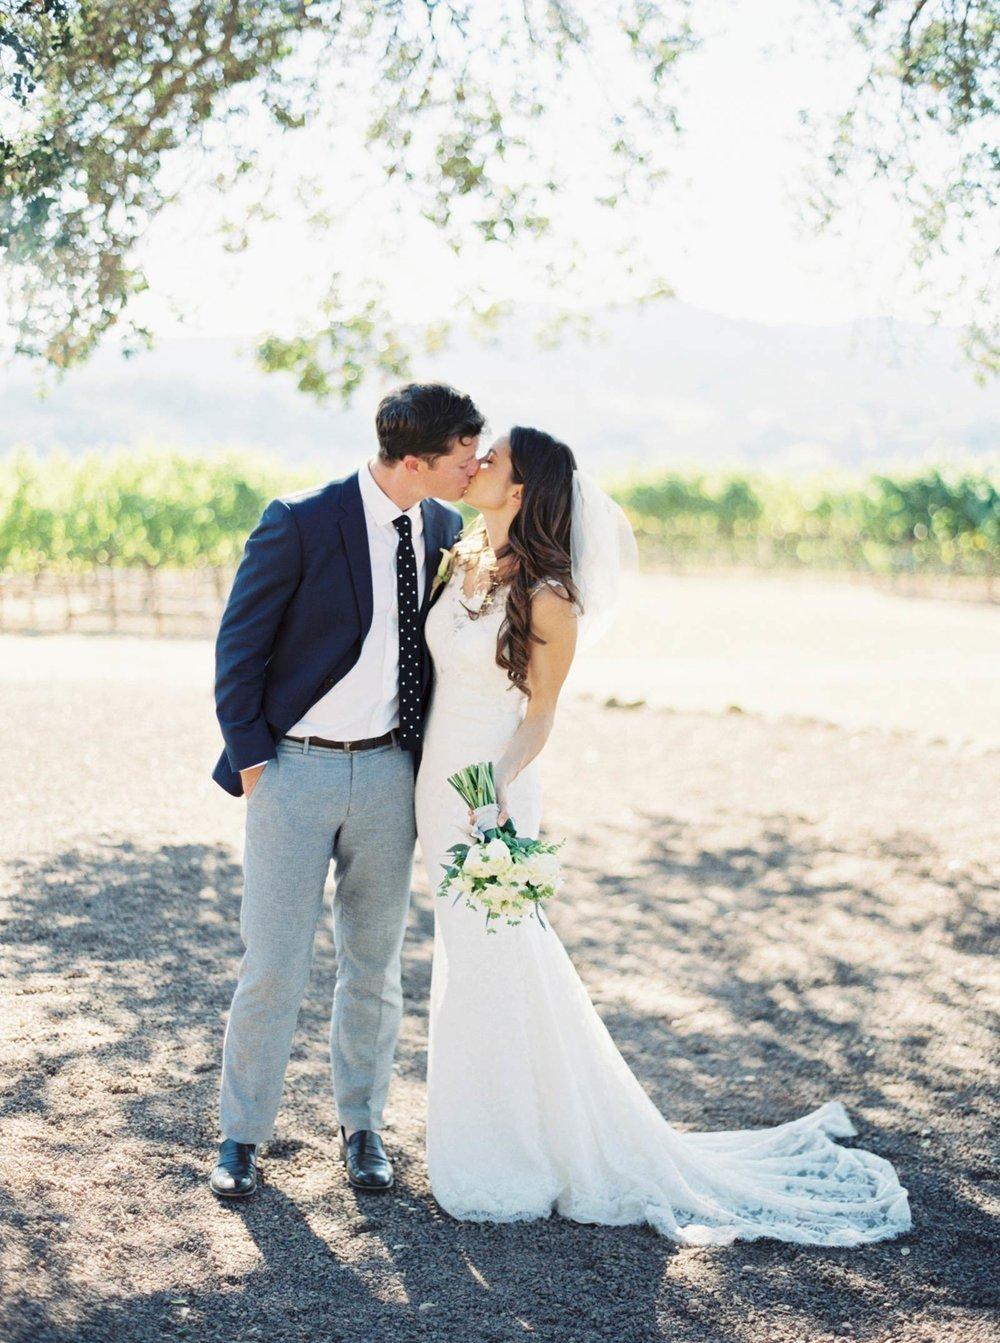 Napa-wedding-Kunde-winery-031.jpg